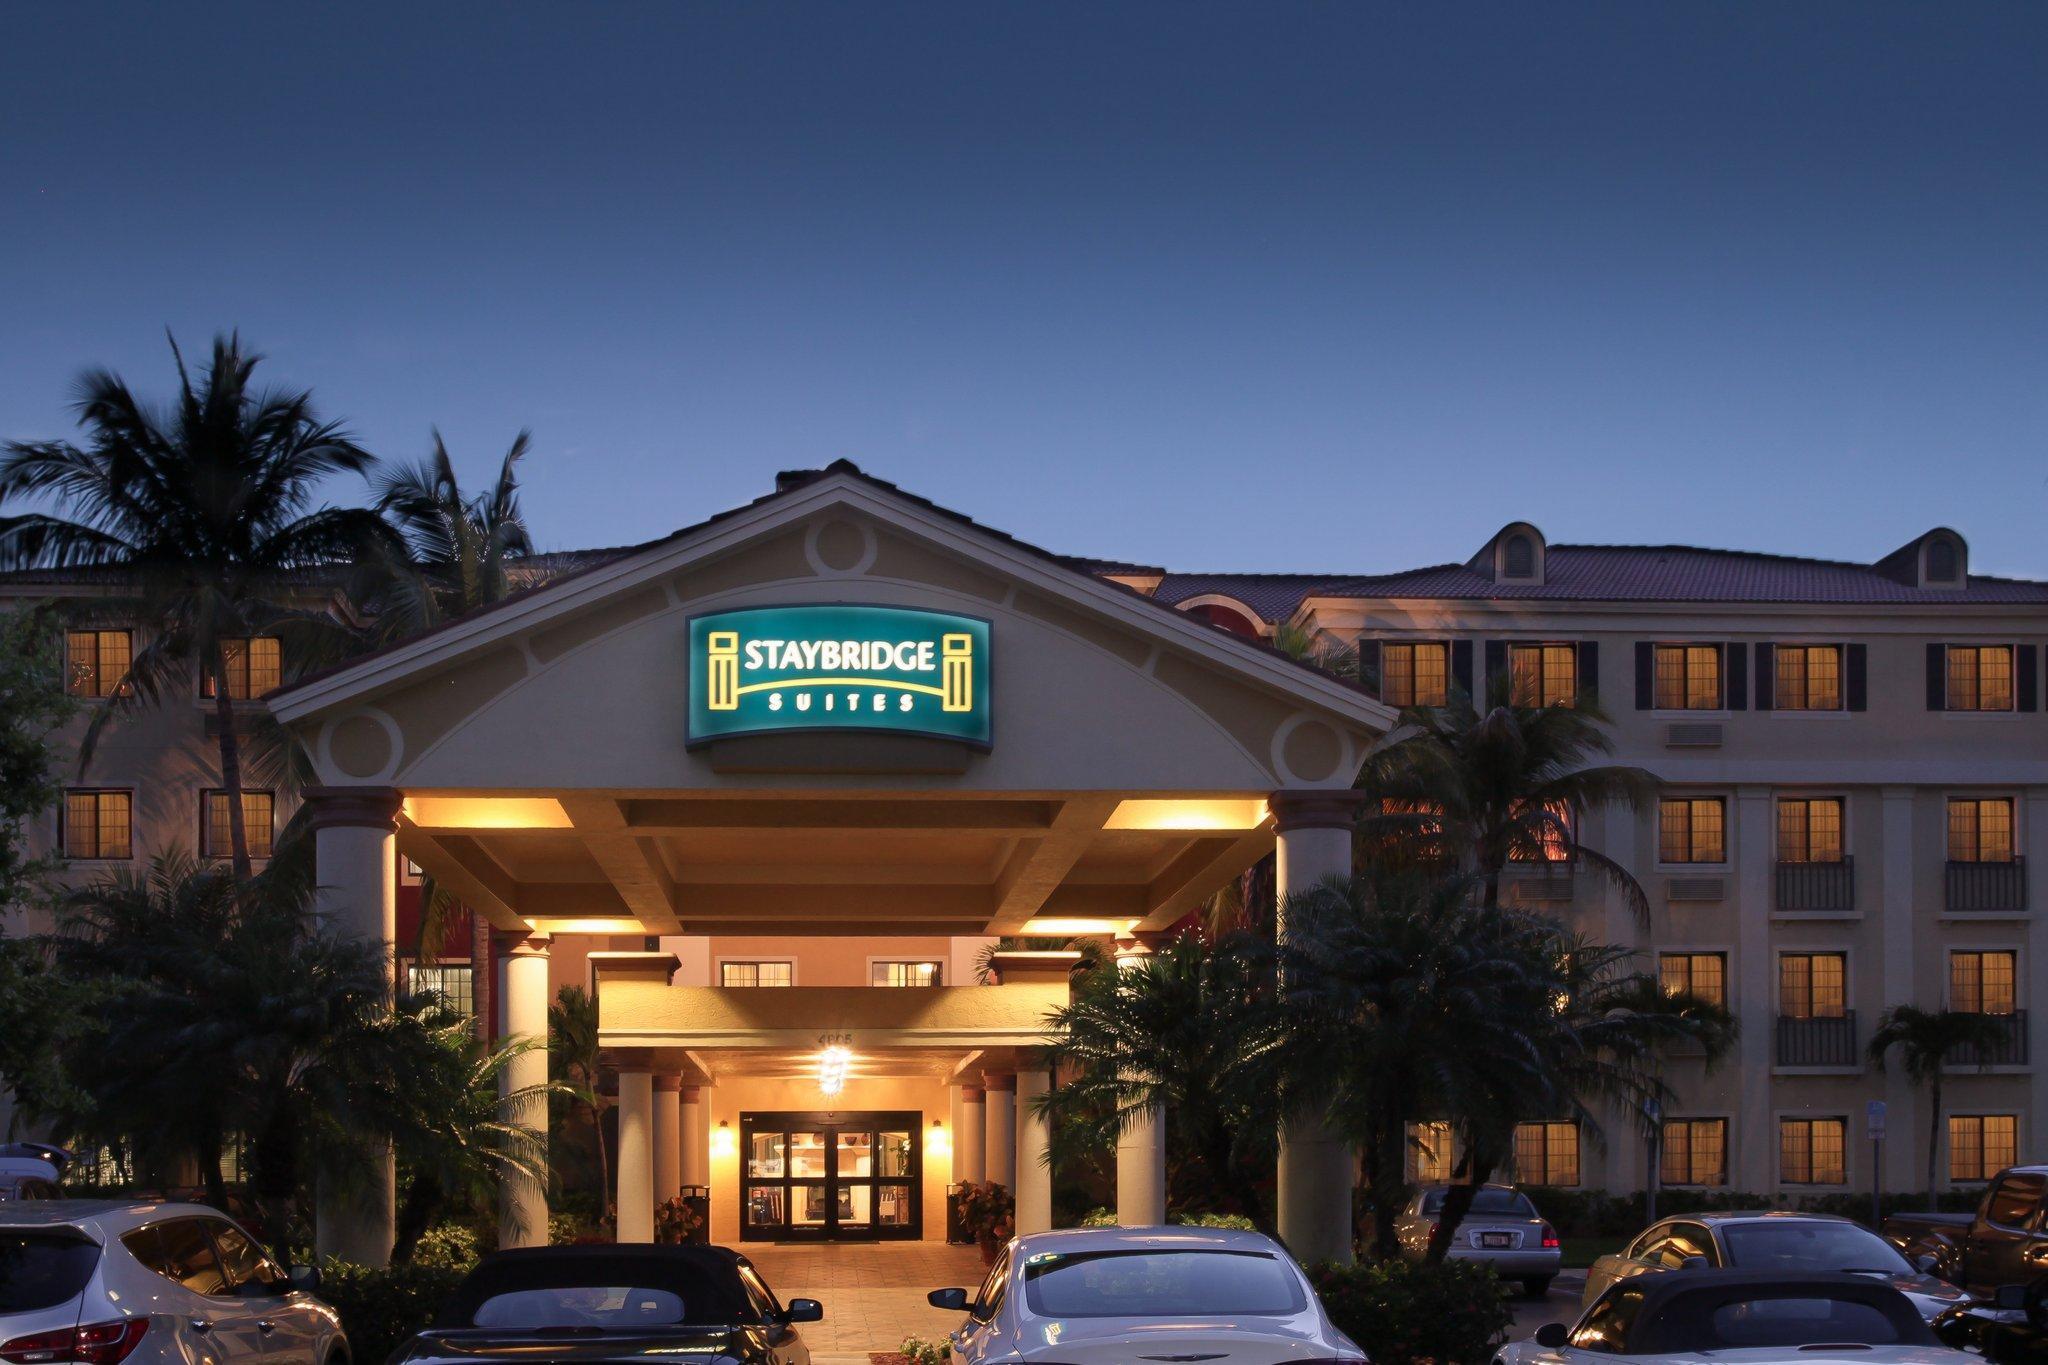 Staybridge Suites Naples   Gulf Coast